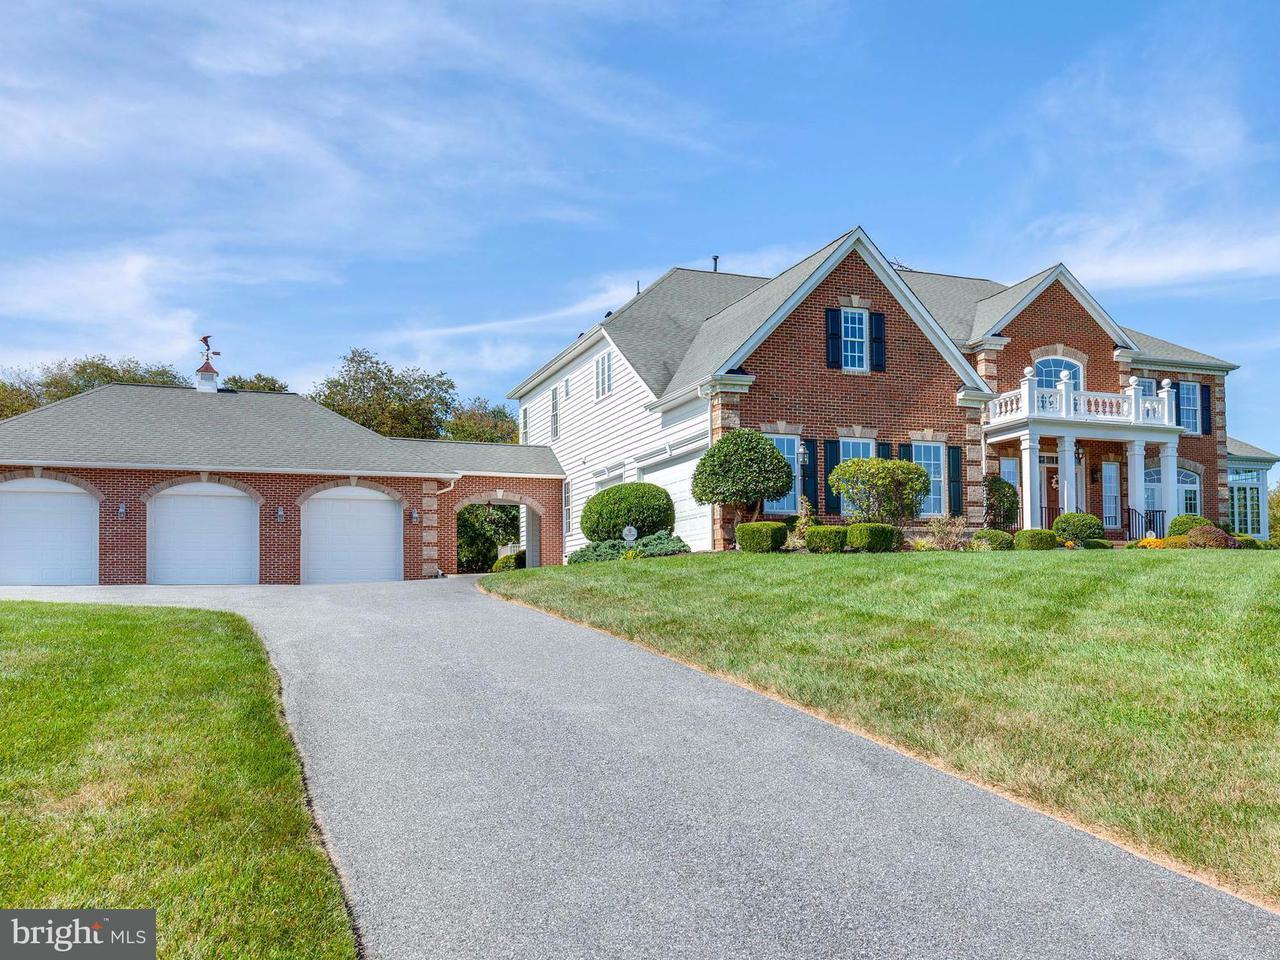 独户住宅 为 销售 在 4322 LAKE FOREST Court 4322 LAKE FOREST Court Finksburg, 马里兰州 21048 美国